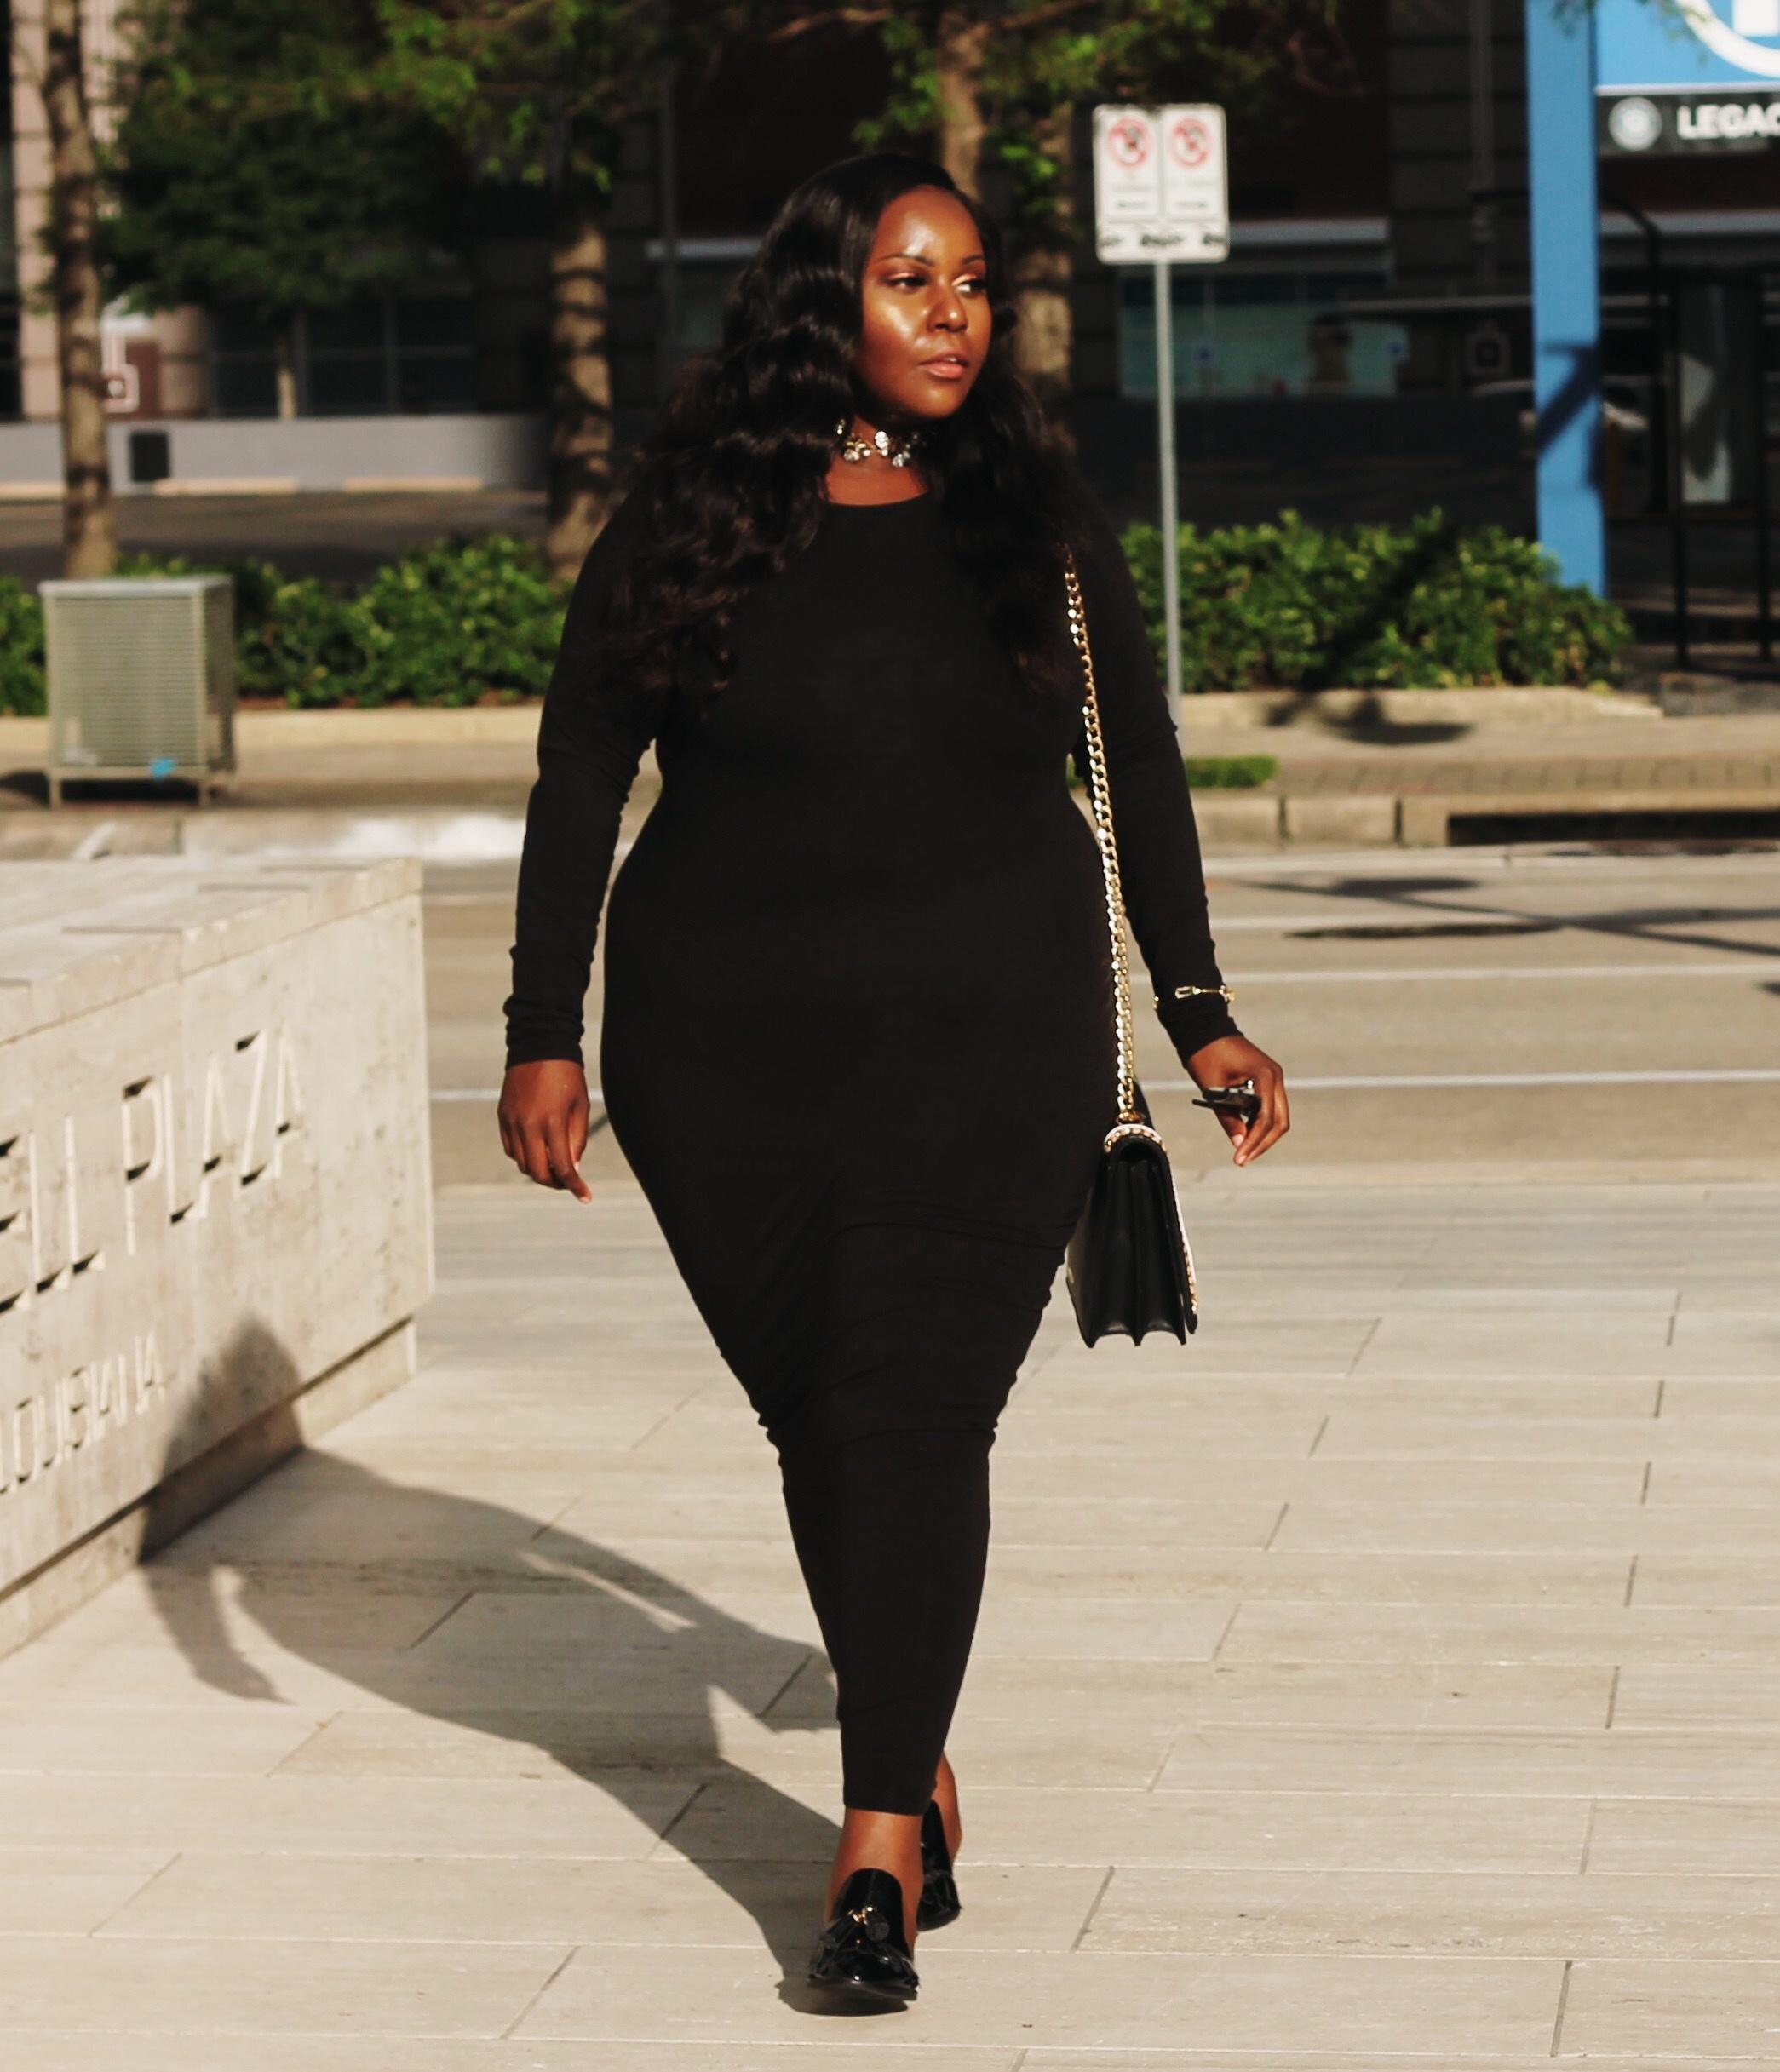 plus size black bloggers, clothes for curvy girls, curvy girl fashion clothing, plus blog, plus size fashion tips, plus size women blog, at fashion blog, plus size high fashion, curvy women fashion, plus blog, curvy girl fashion blog, style plus curves, plus size fashion instagram, curvy girl blog, bbw blog, plus size street fashion, plus size beauty blog, plus size fashion ideas, curvy girl summer outfits, plus size fashion magazine, plus fashion bloggers, boohoo, rebdolls bodycon maxi dresses